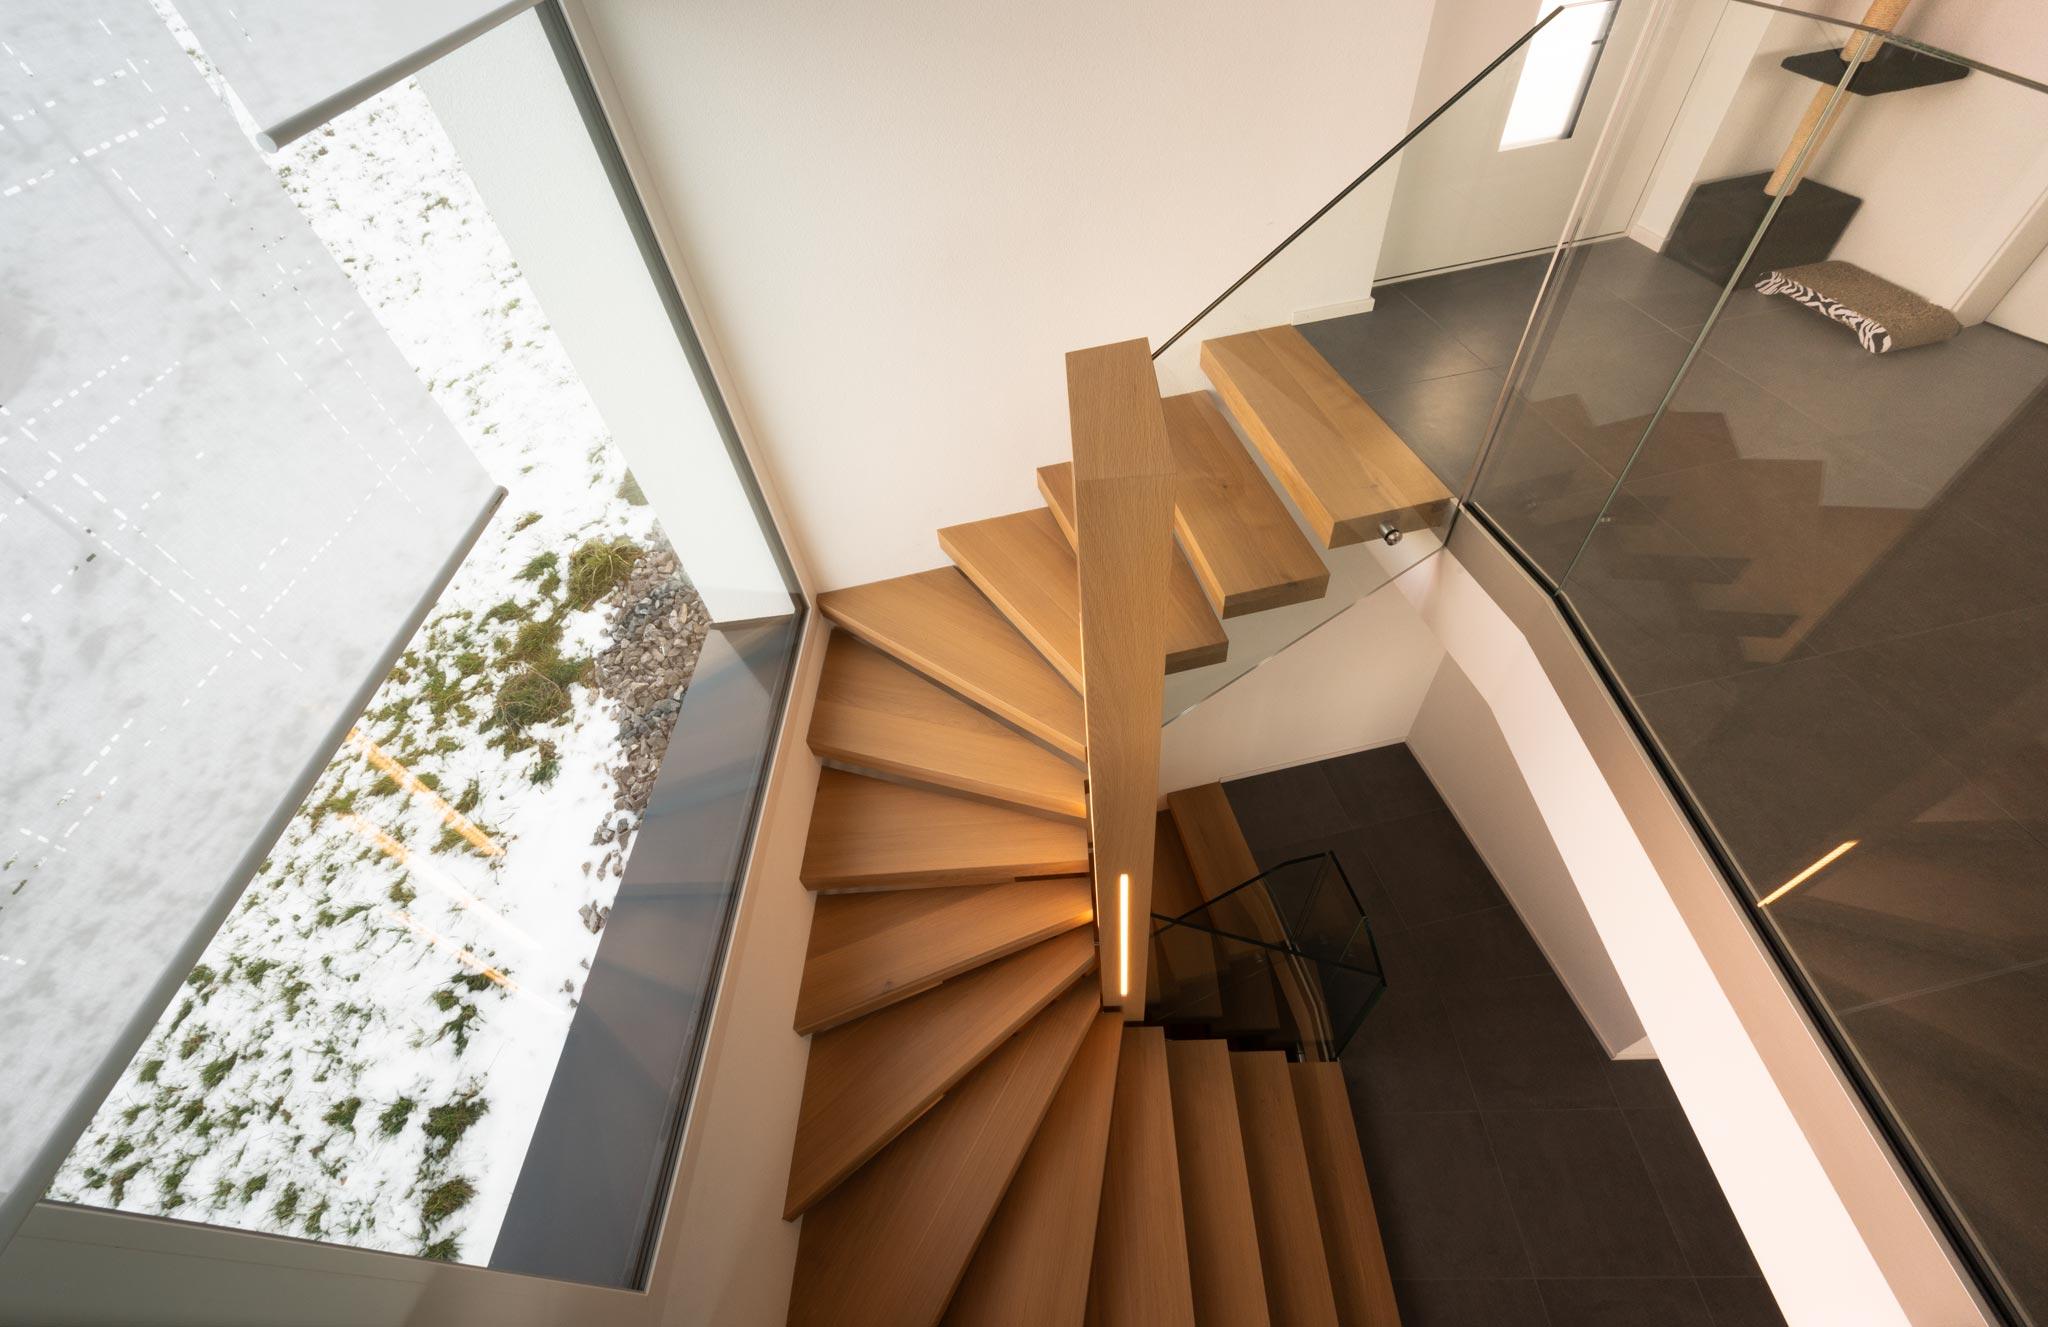 ES Gin 7697 escalier hor 21 01 0004 - Escalier à Cheyres (GJ)